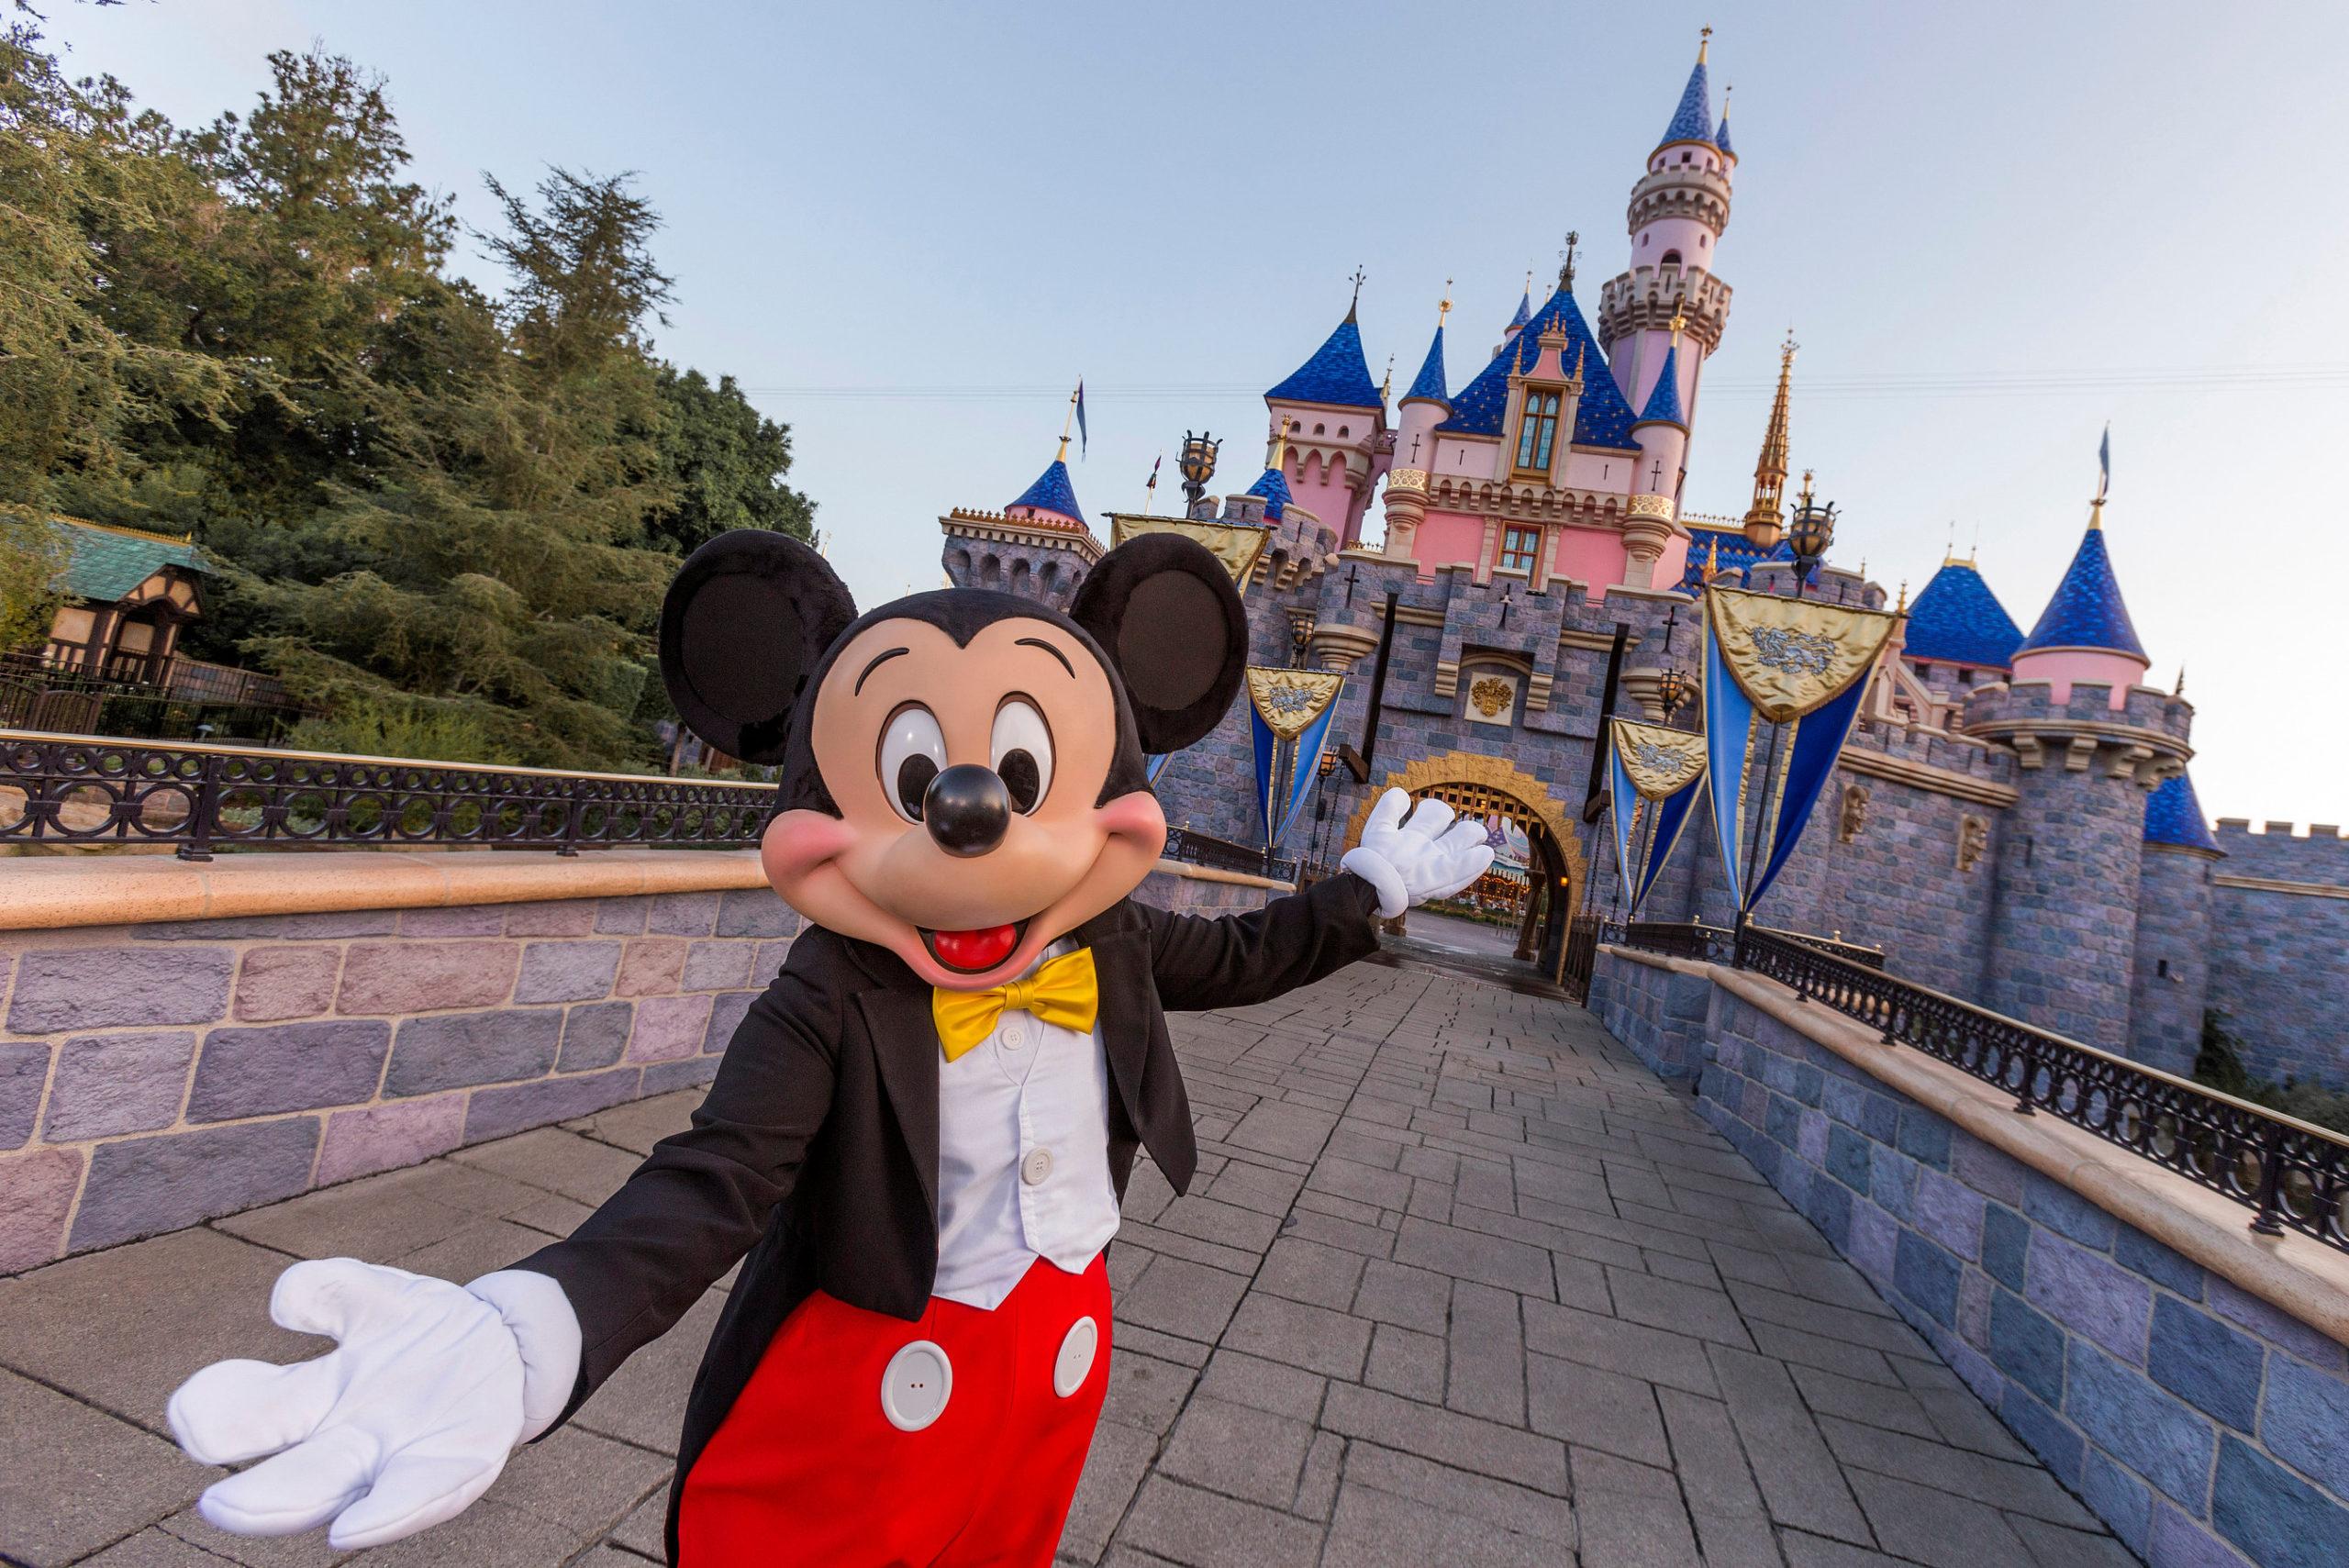 Both Disneyland Park and Disney California Adventure Park will reopen April 30